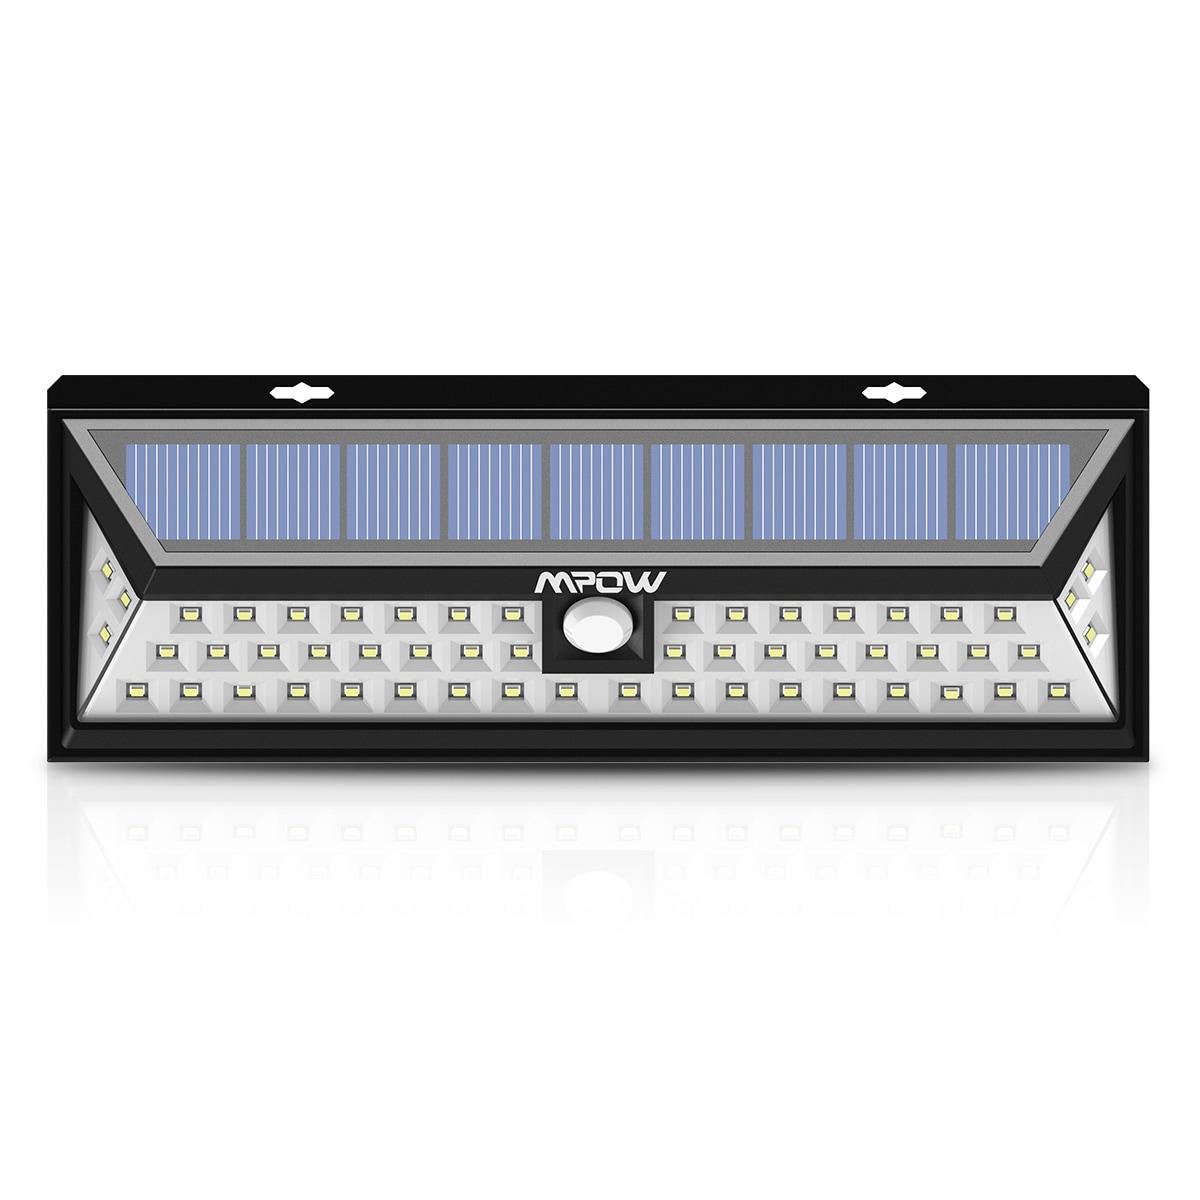 Mpow 54 LED Solar Lights Outdoor Waterproof Solar Power L...